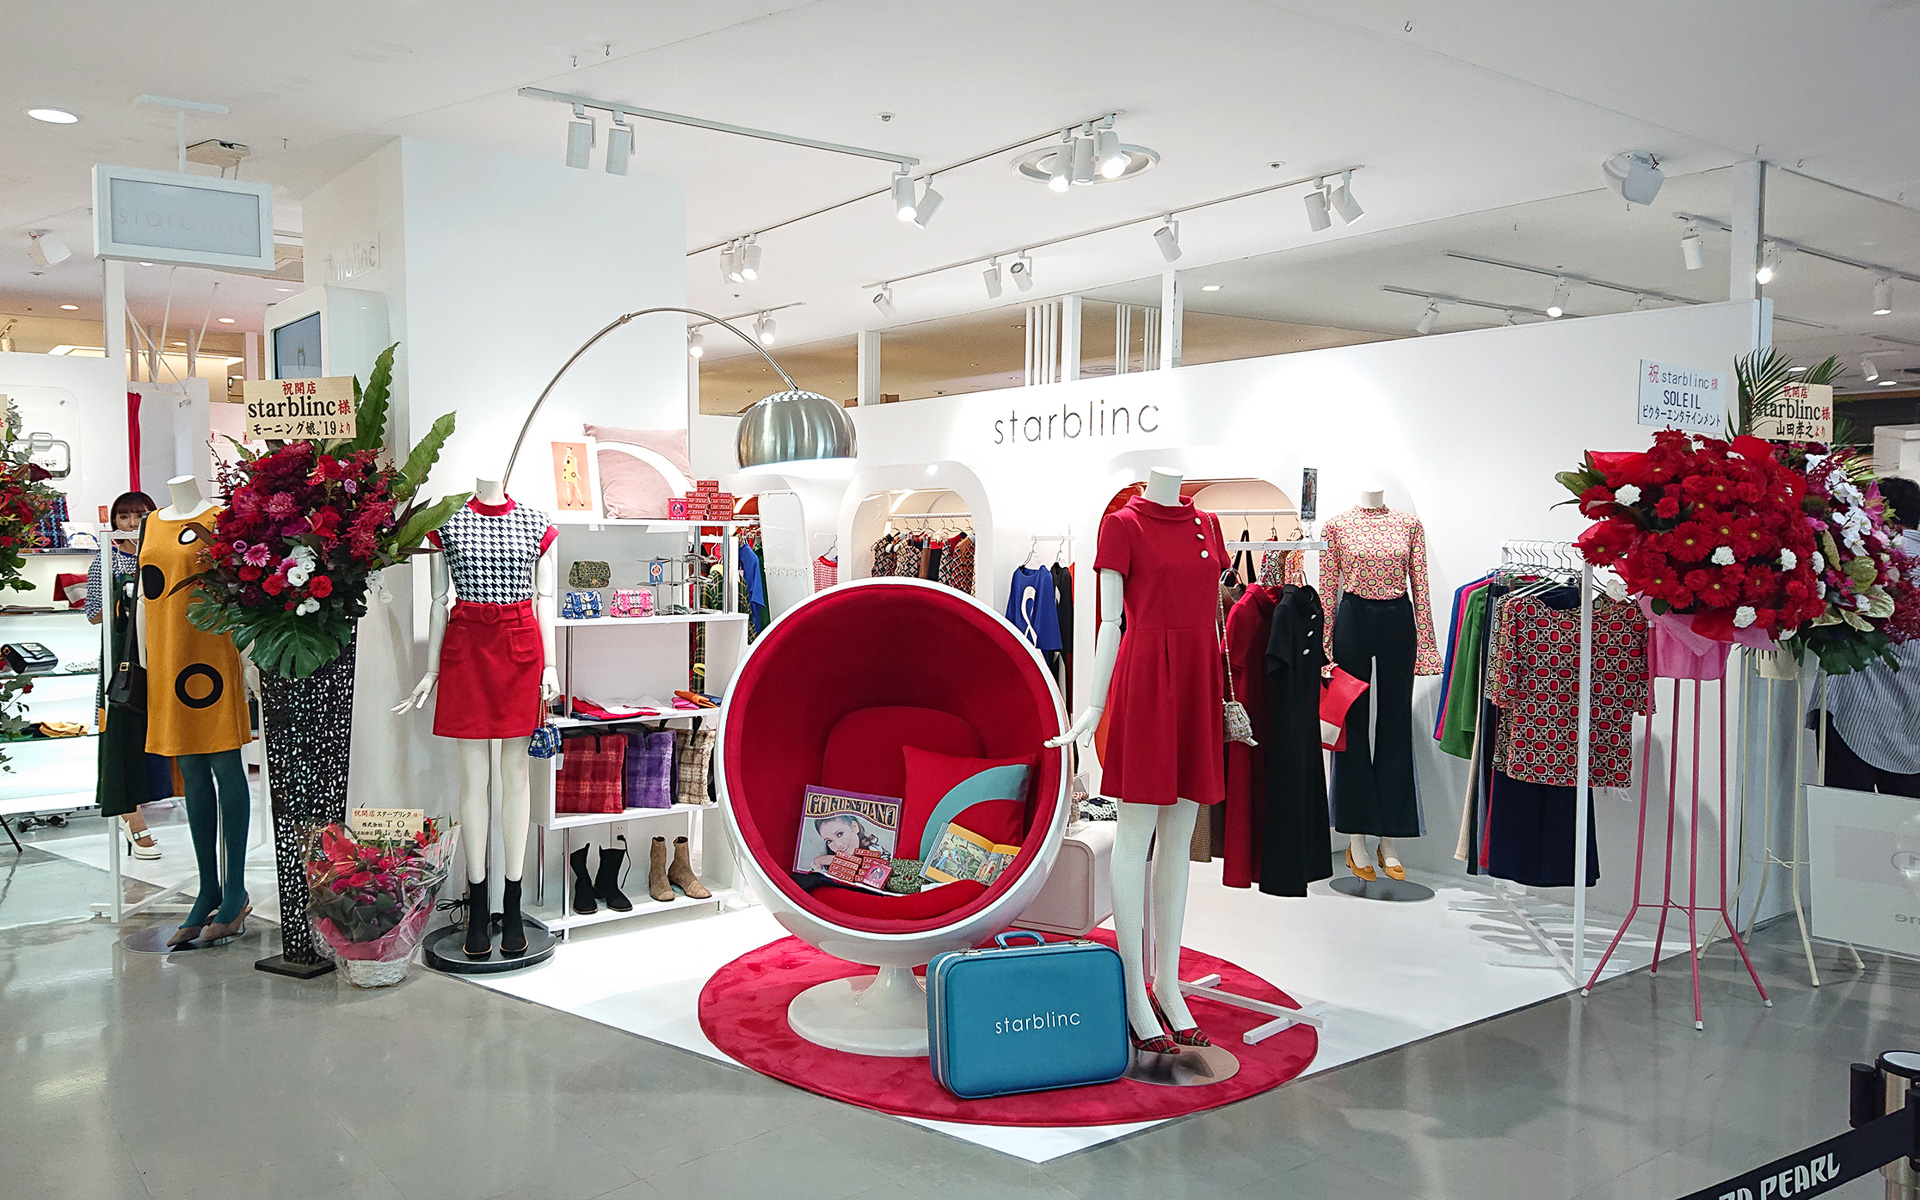 starblinc ラフォーレ原宿店(東京都渋谷区神宮前1-11-6ラフォーレ原宿2F)